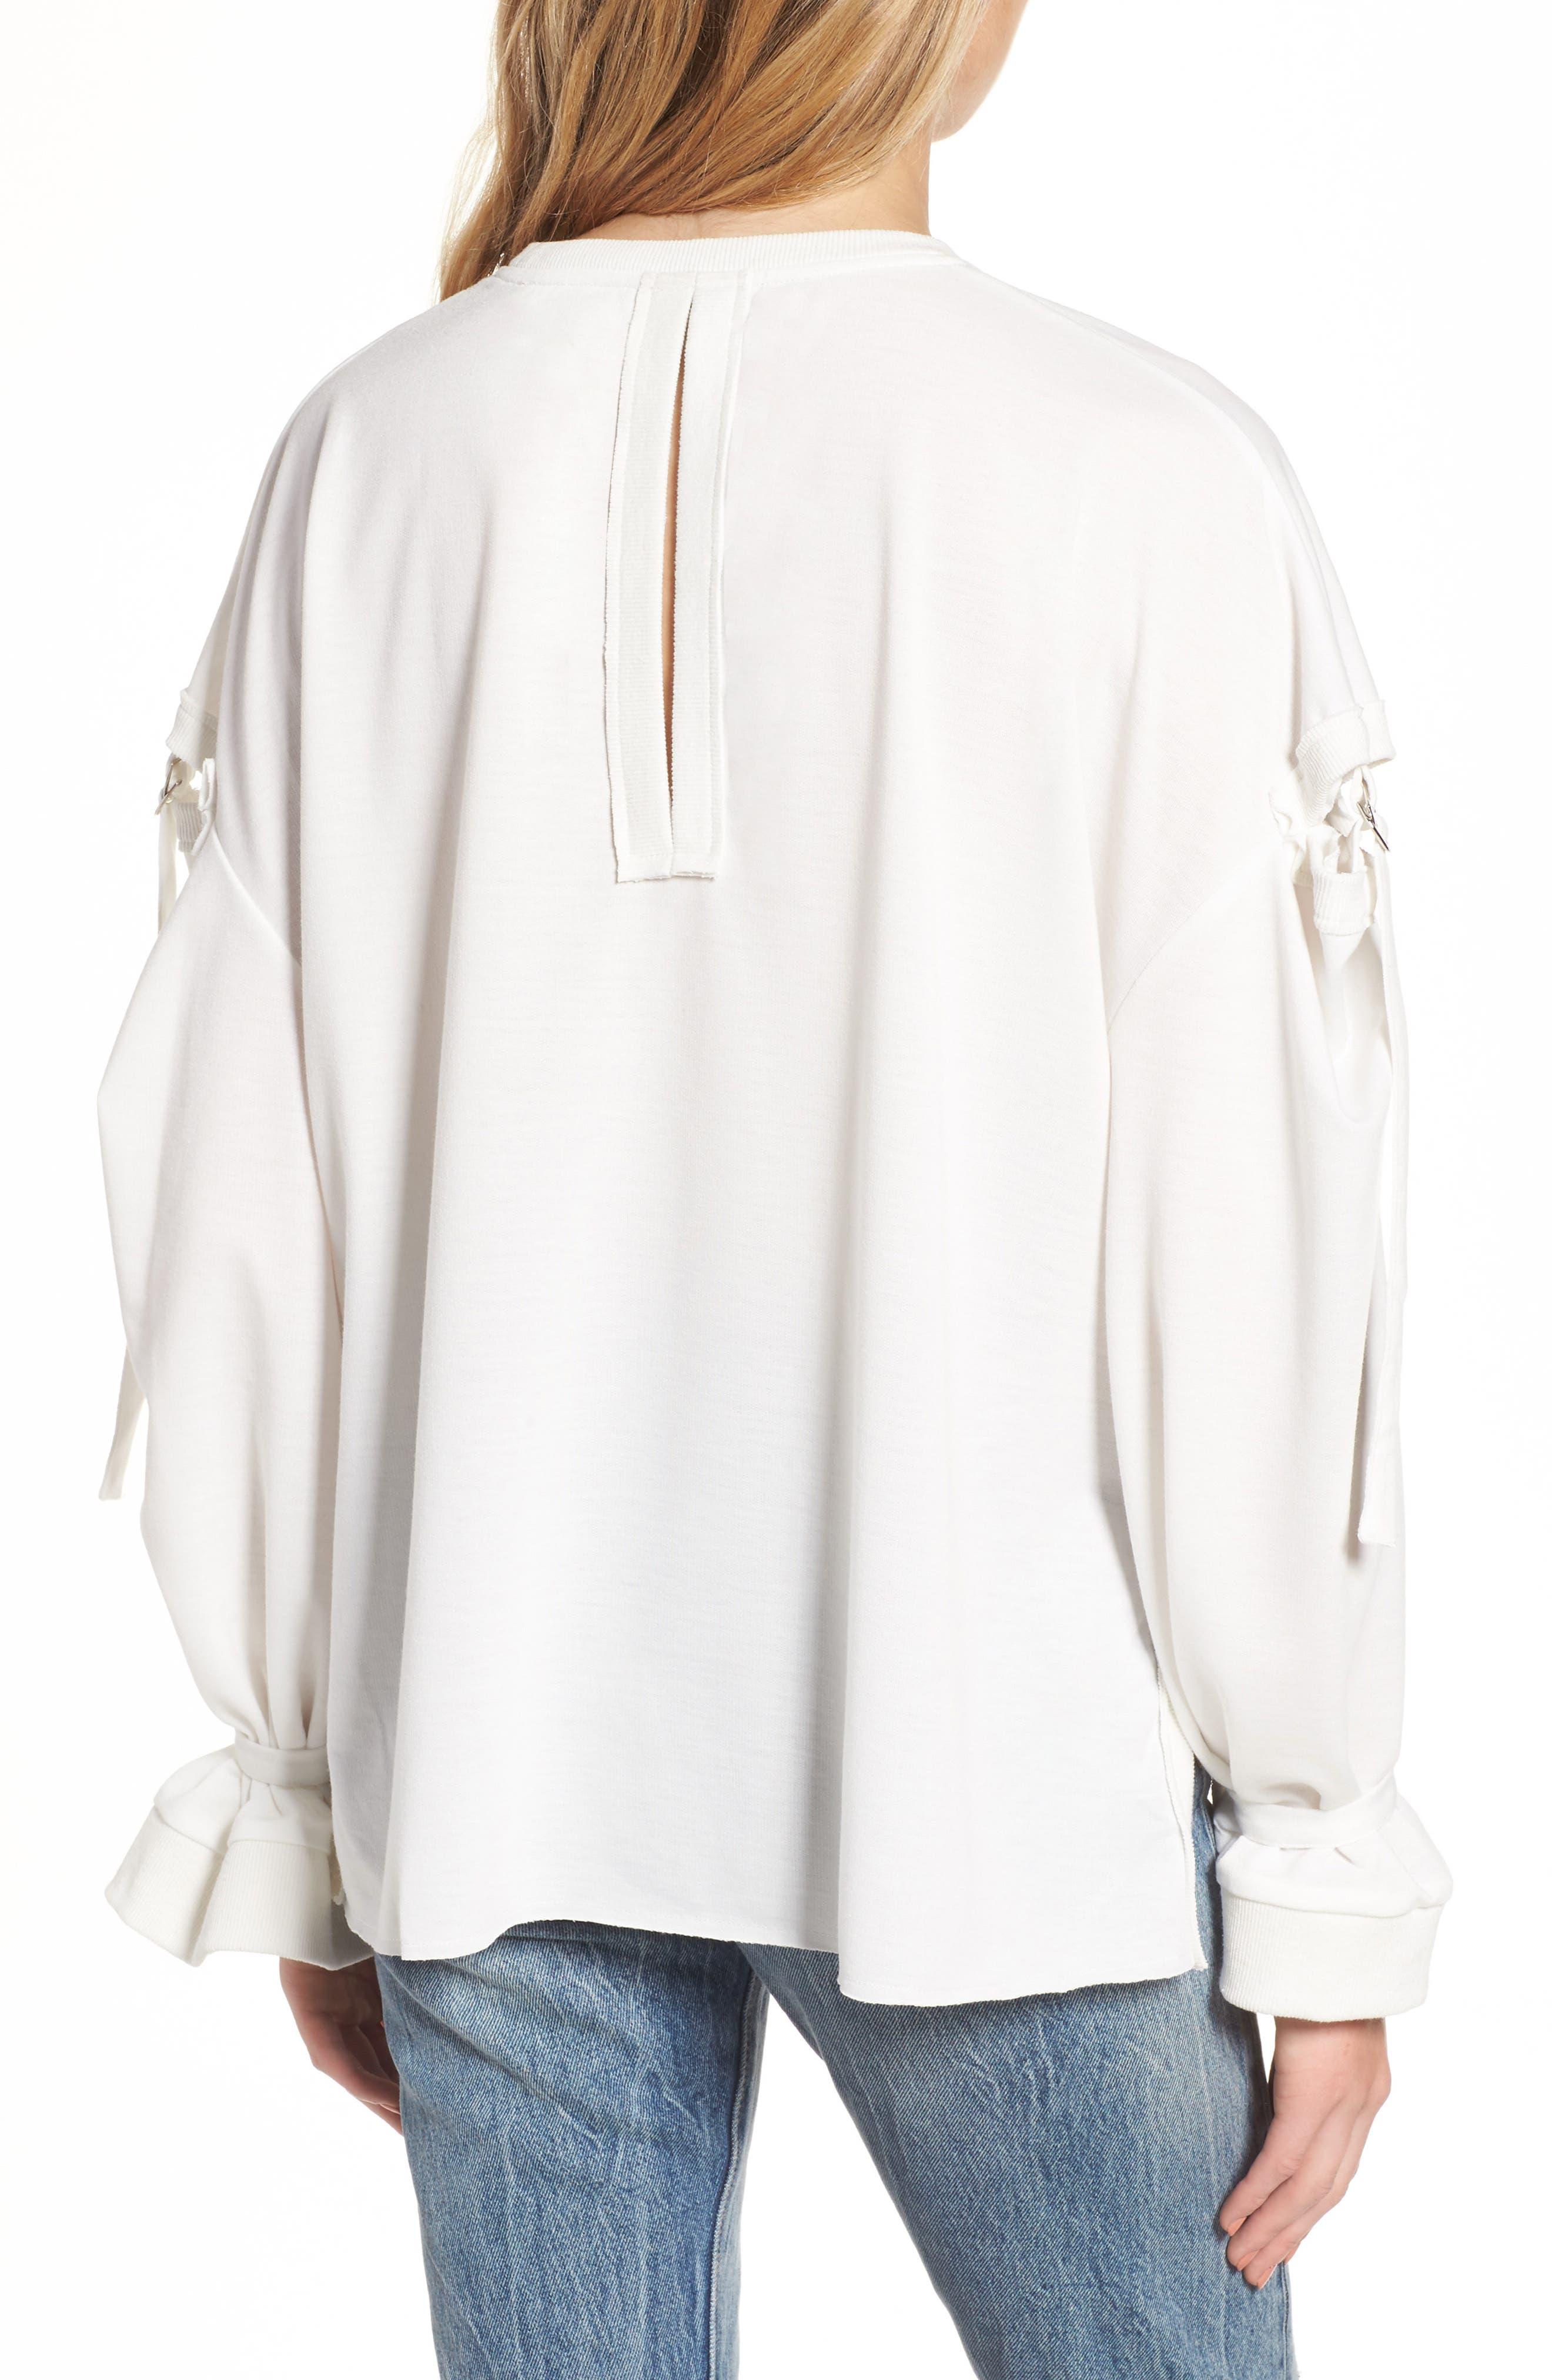 Cutout Detail Sweatshirt,                             Alternate thumbnail 2, color,                             White